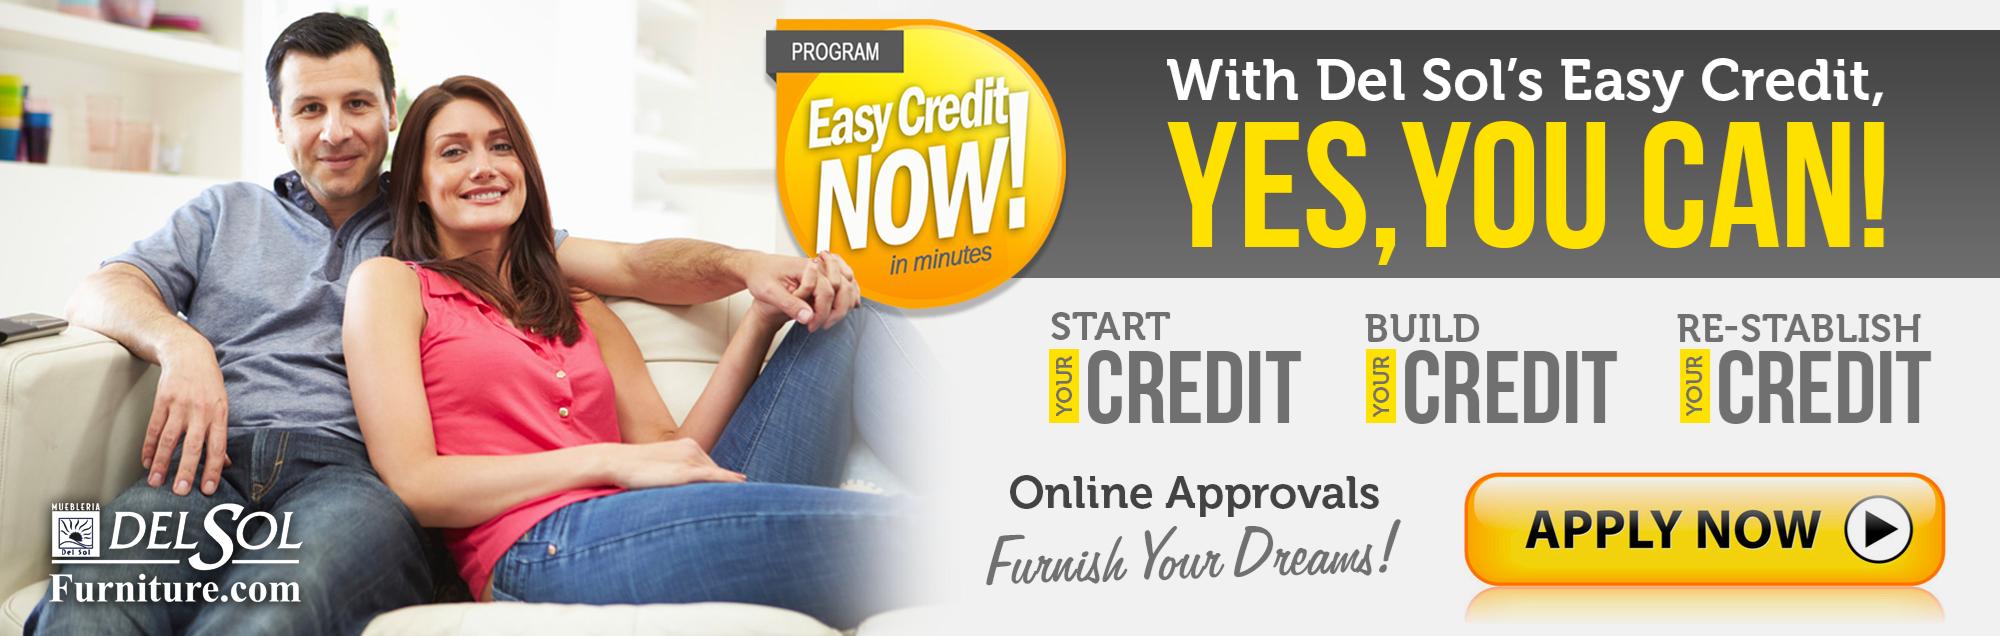 Easy Credit Furniture Financing Del